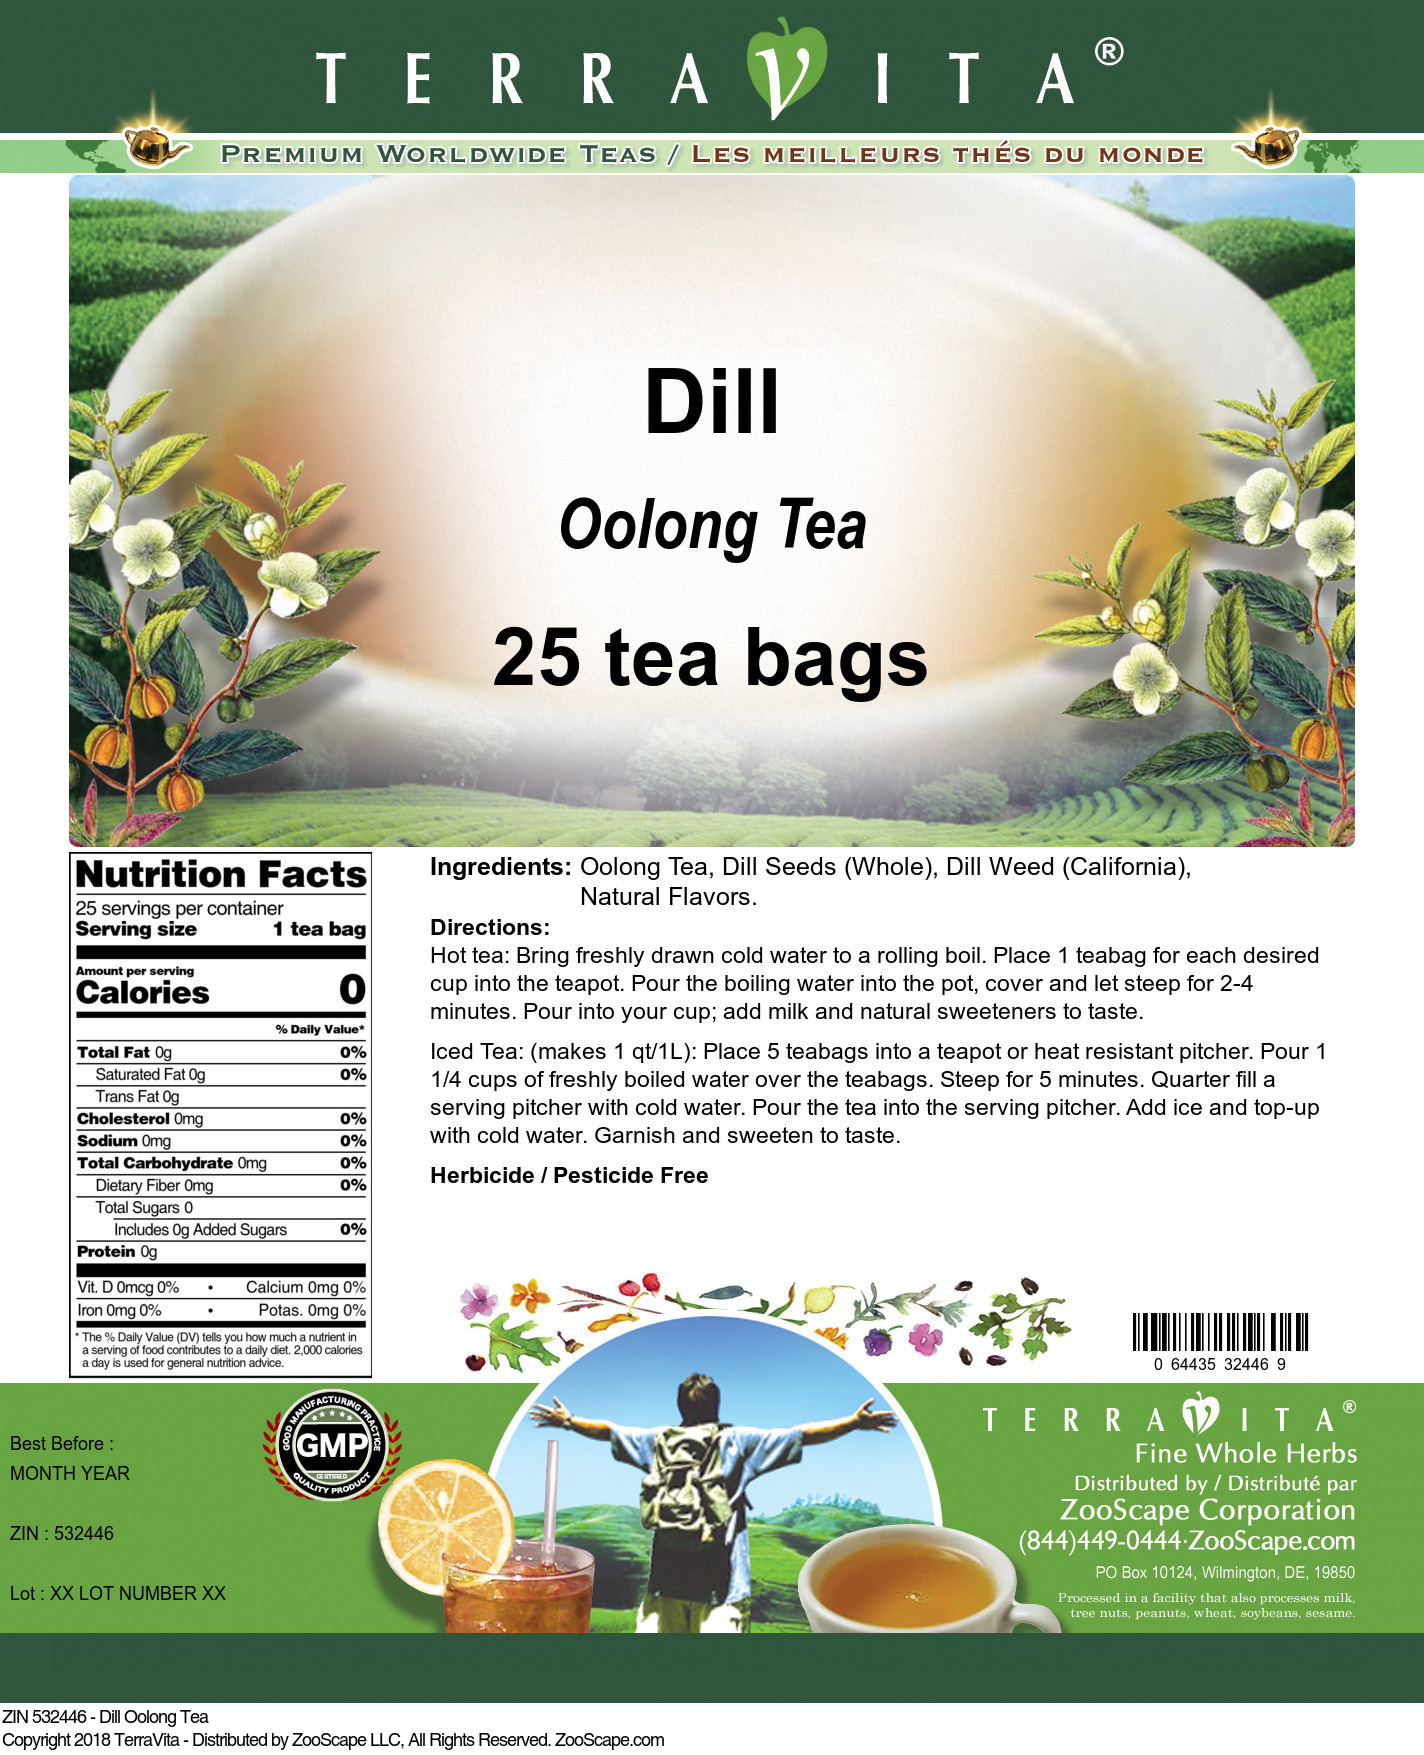 Dill Oolong Tea